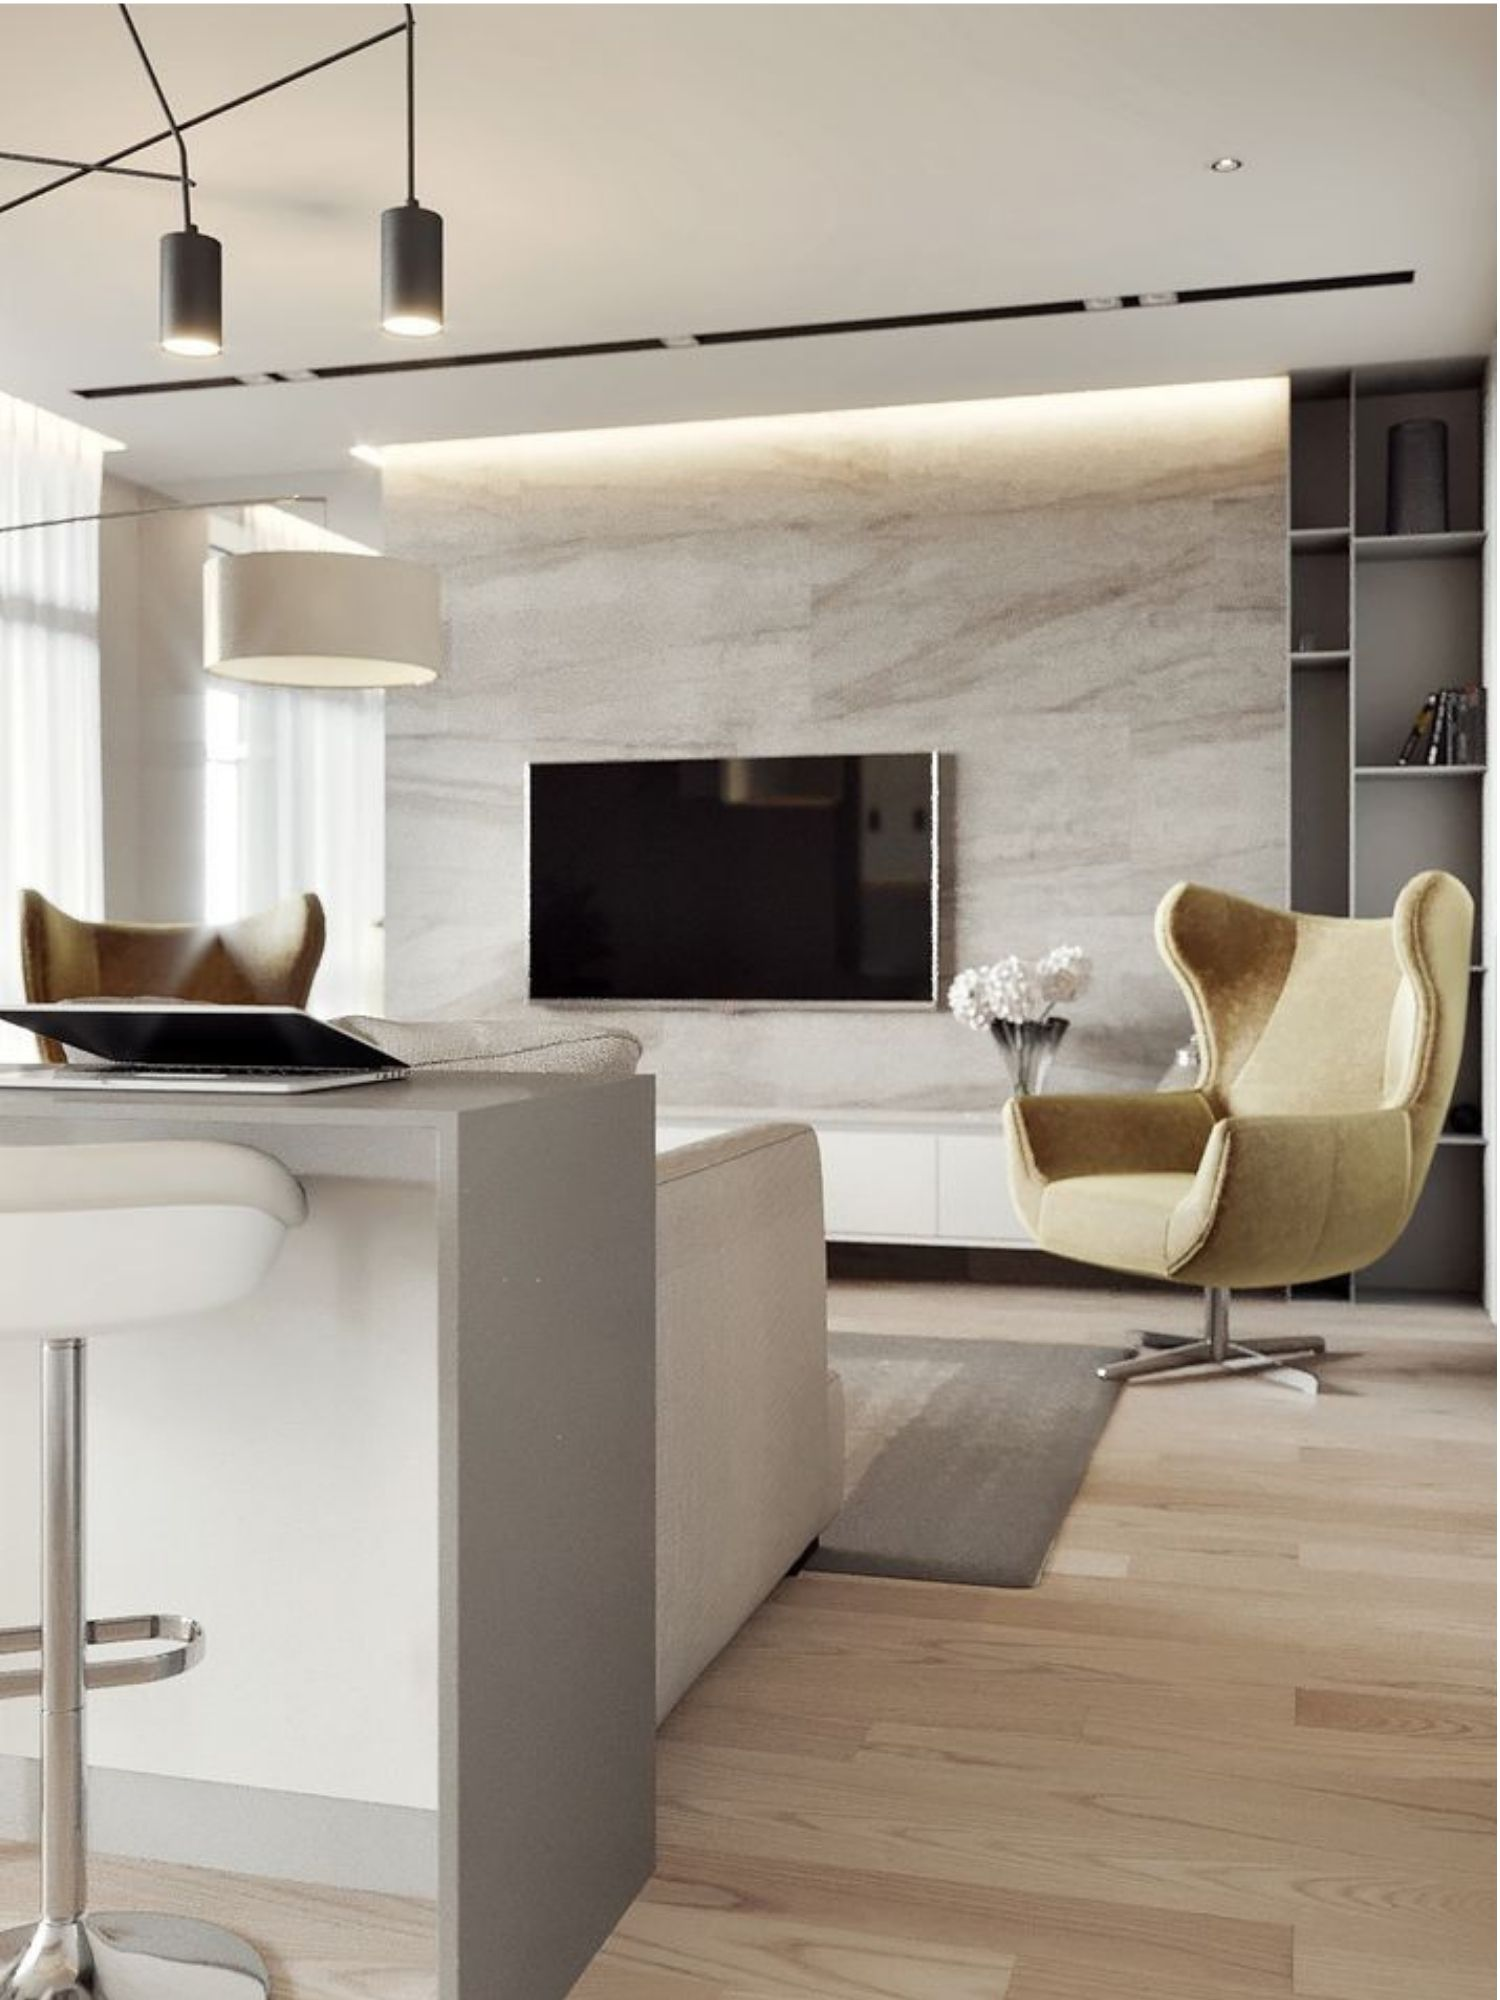 Best Modern Interior Design Concepts All You Need To Know 628 Moderninteriordesign Design Interiordesign Interior Modernhomed Modern Interior Modern Interior Design Modern House Design